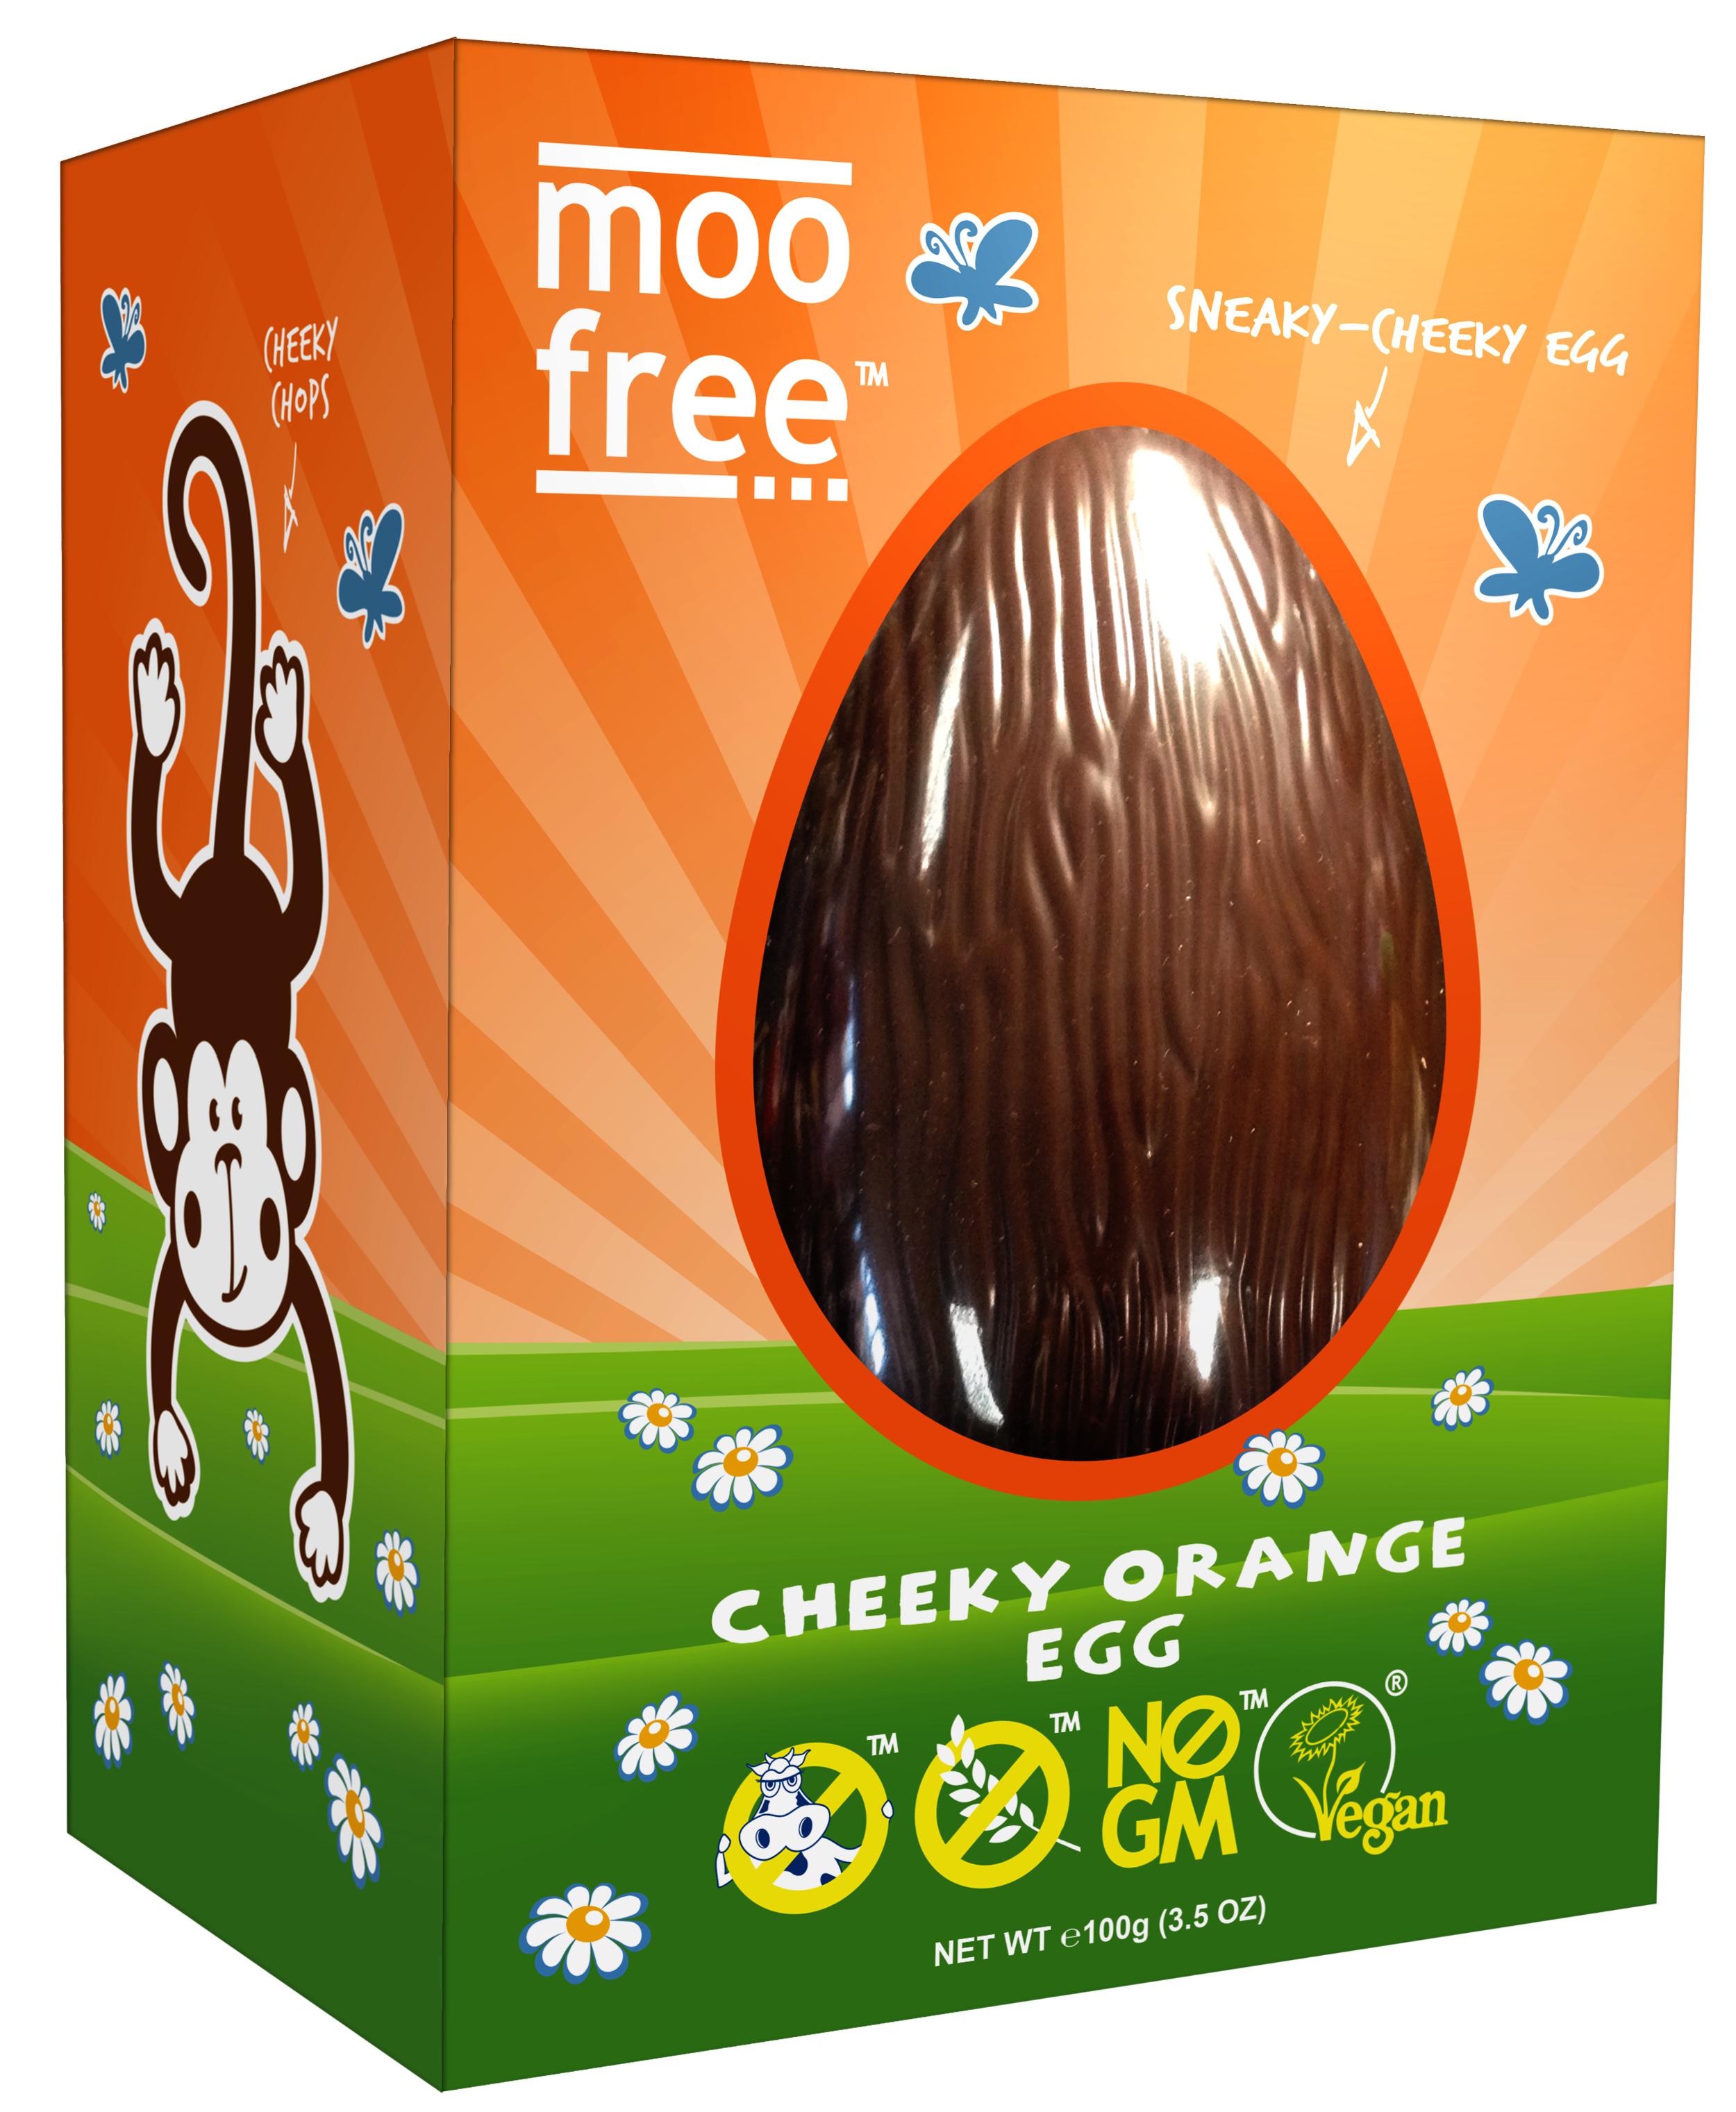 moo-free-orange-easter-egg-hi-res.jpg